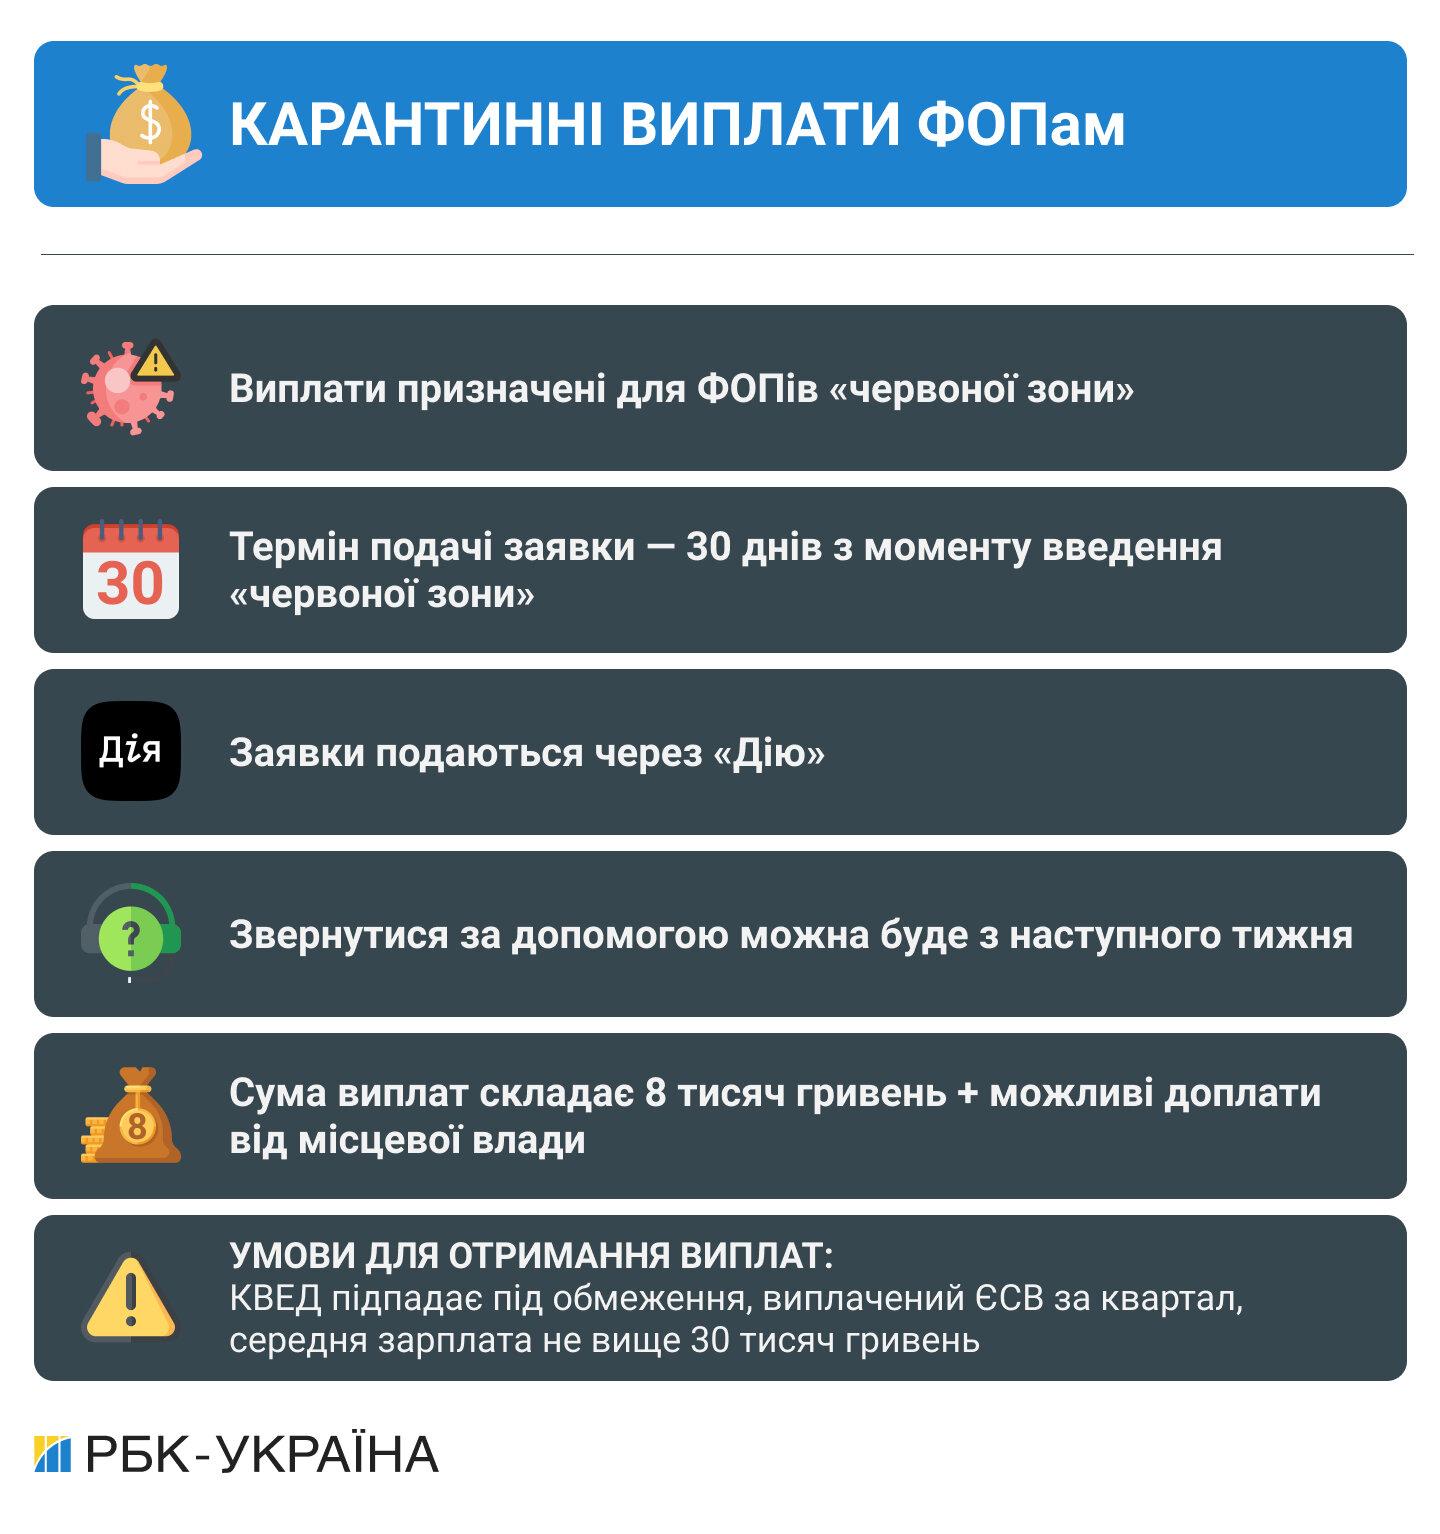 rbc_info_fop_red_zone_ukr.jpg